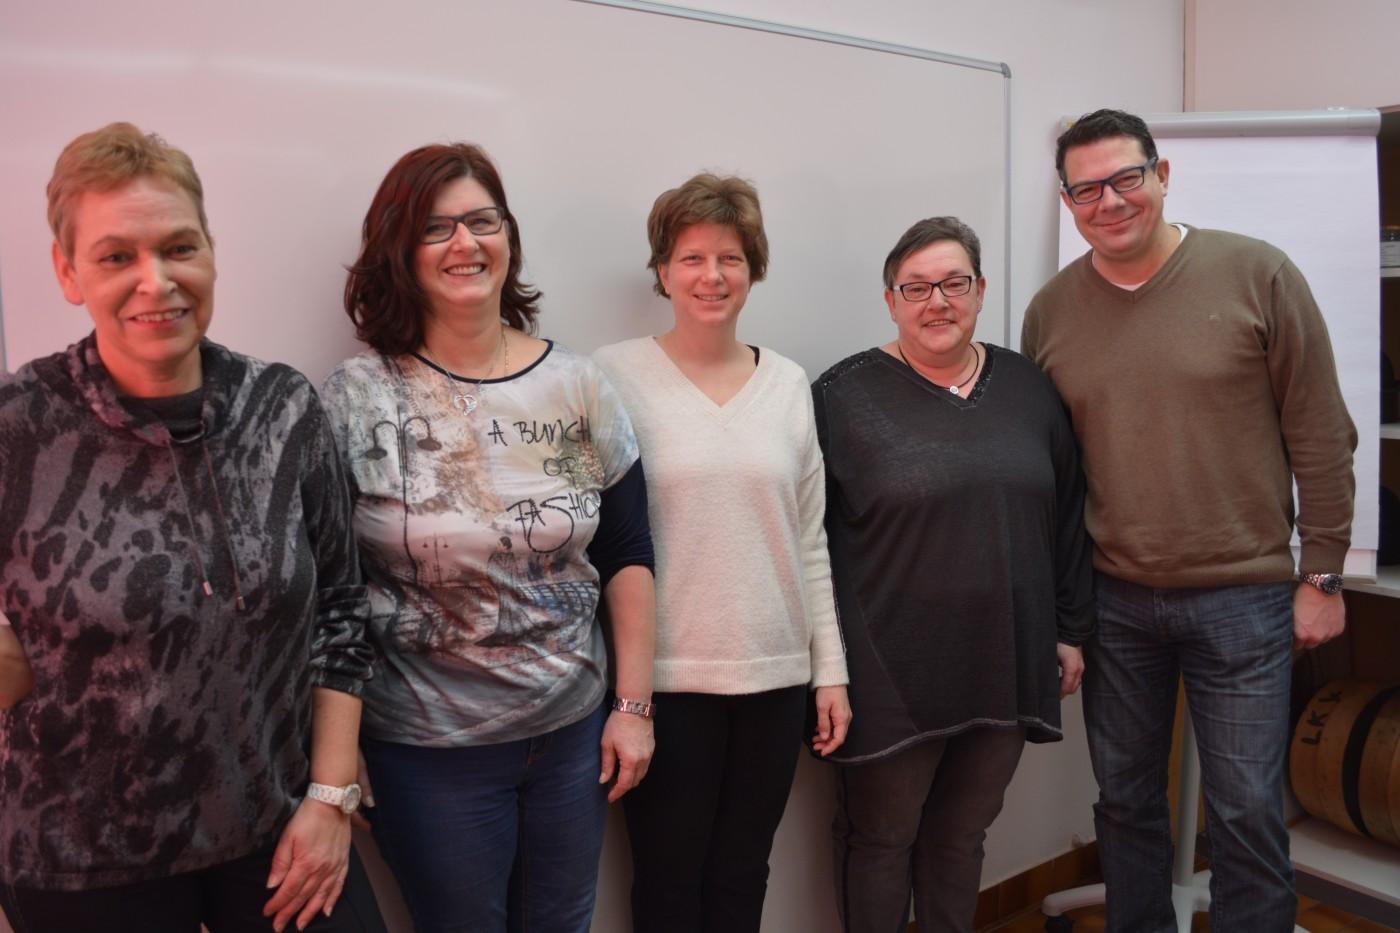 von links nach rechts: Frau Souba Manuela, Frau Gutmann Renate, Frau Dr. Suchomel Alexandra, Frau Pickl Anita, Herr Wolf Gerald